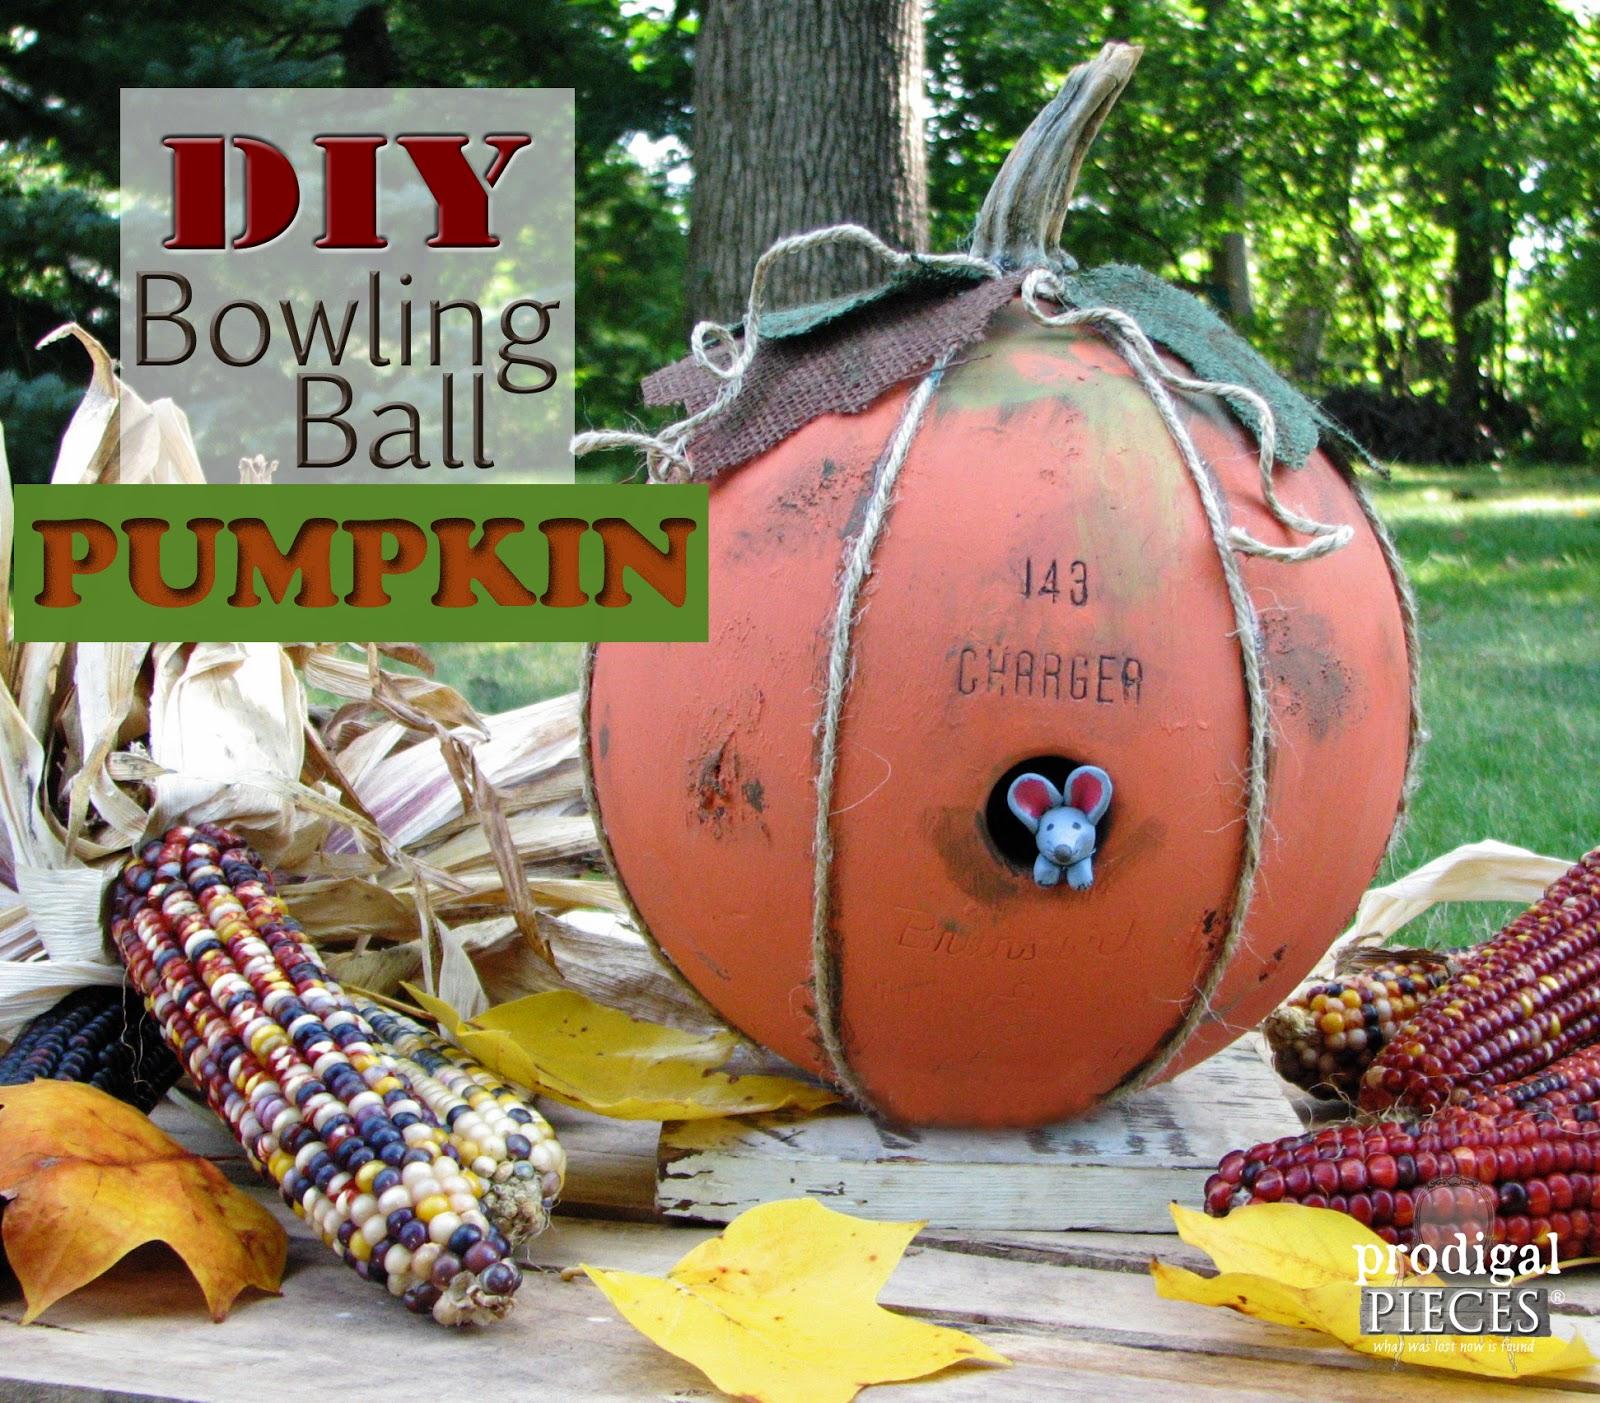 DIY Repuposed Bowling Ball Pumpkin Tutorial by Prodigal Pieces http://www.prodigalpieces.com